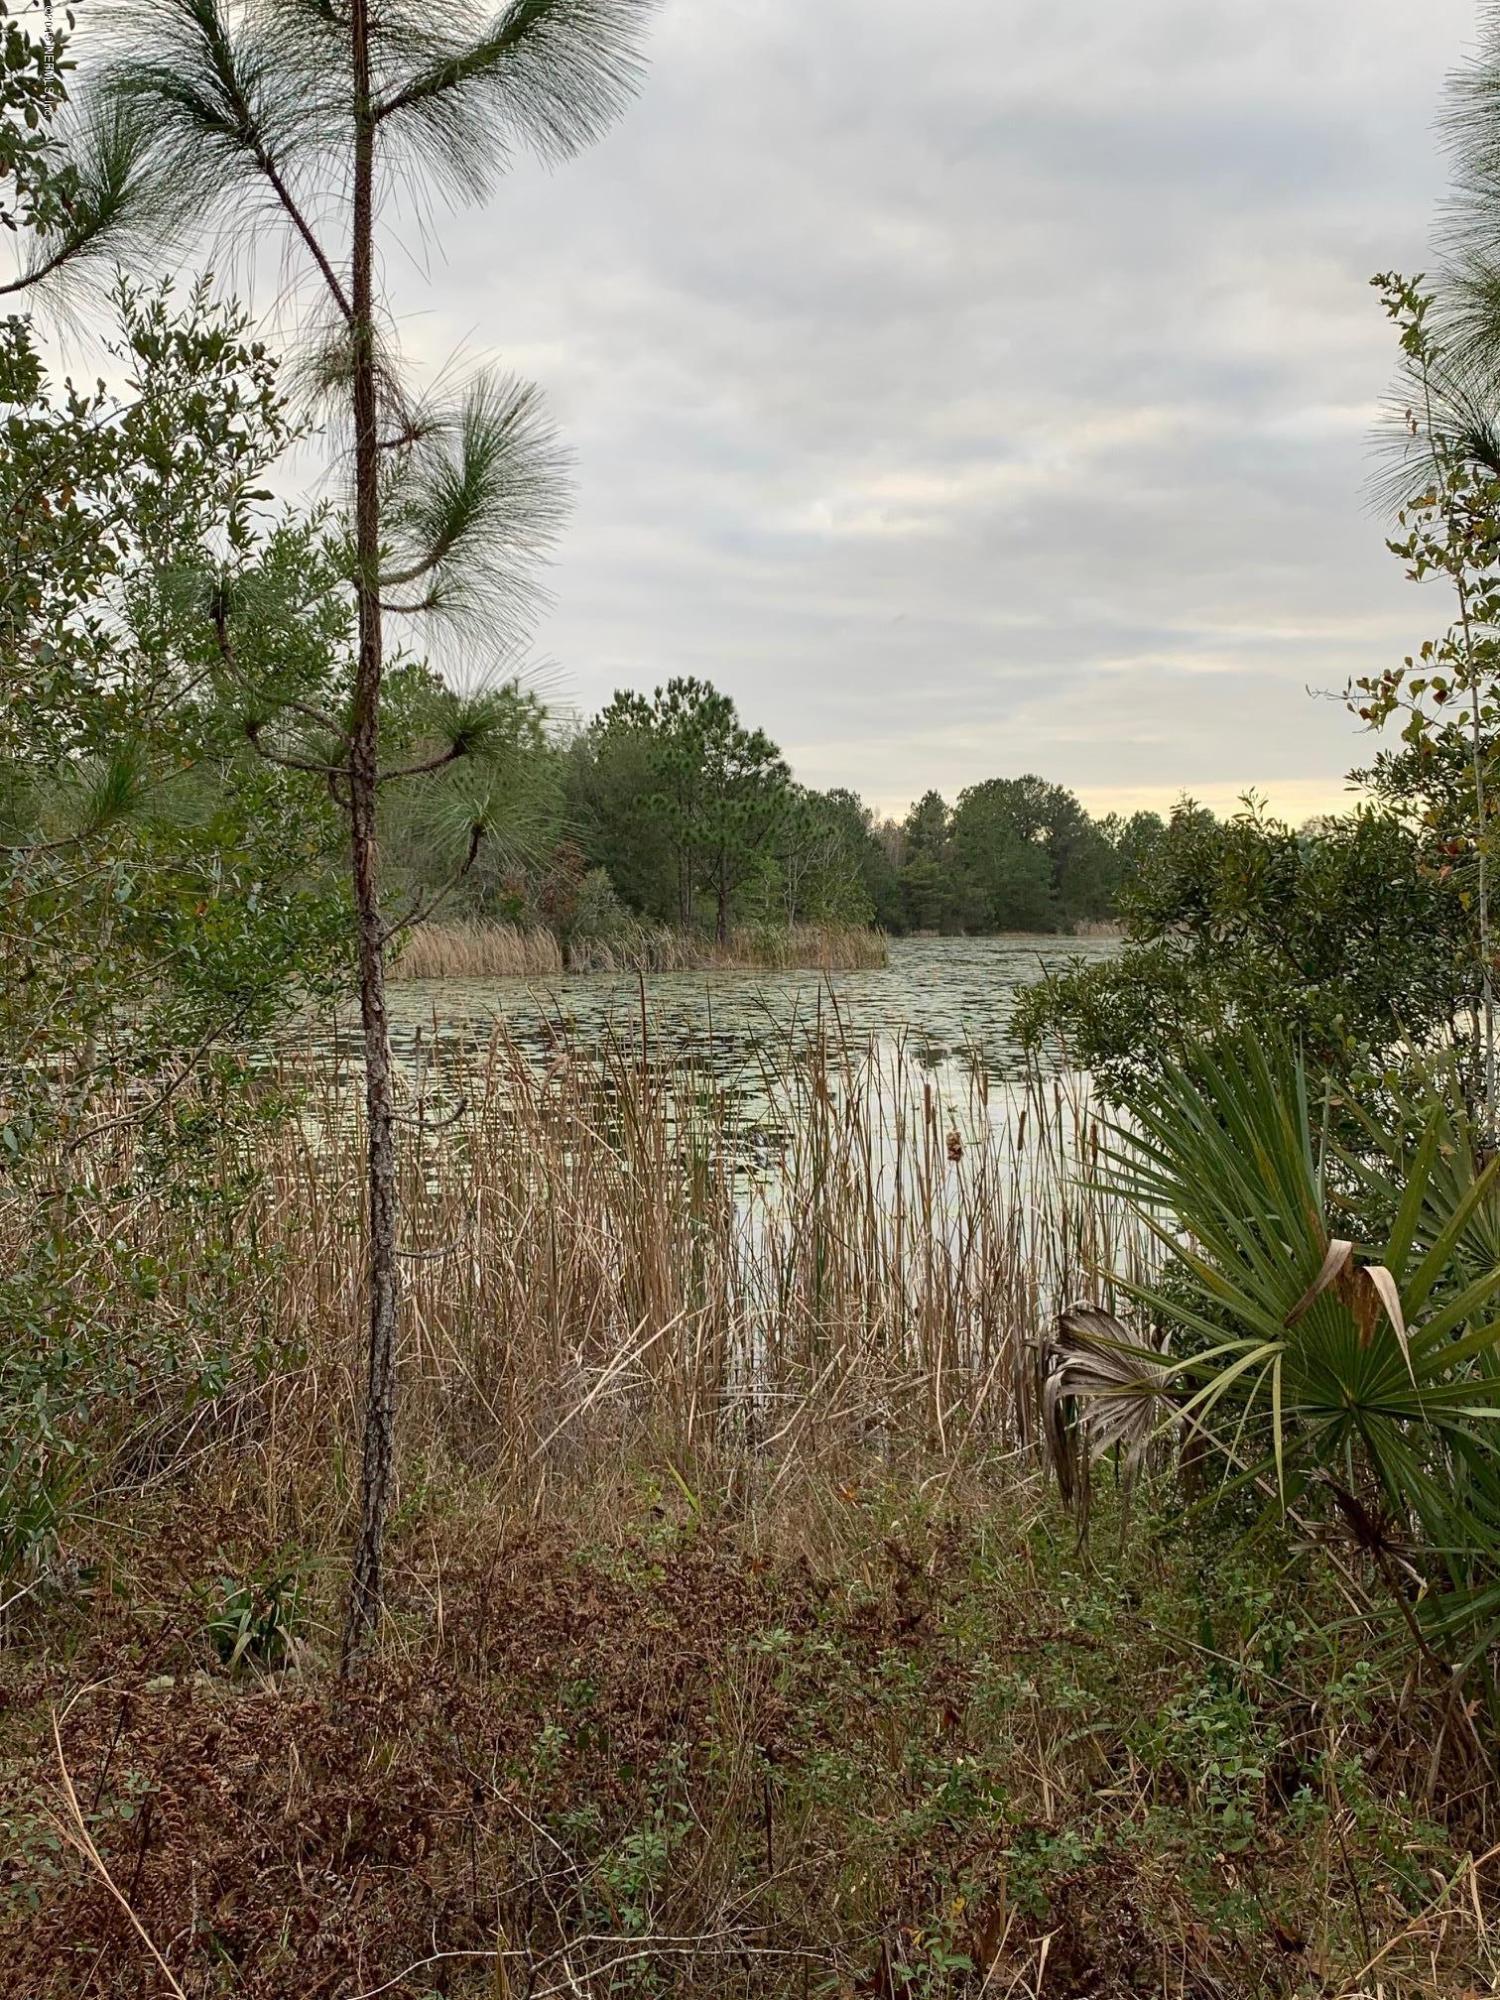 103 LONG BRANCH, INTERLACHEN, FLORIDA 32148, ,Vacant land,For sale,LONG BRANCH,1030659